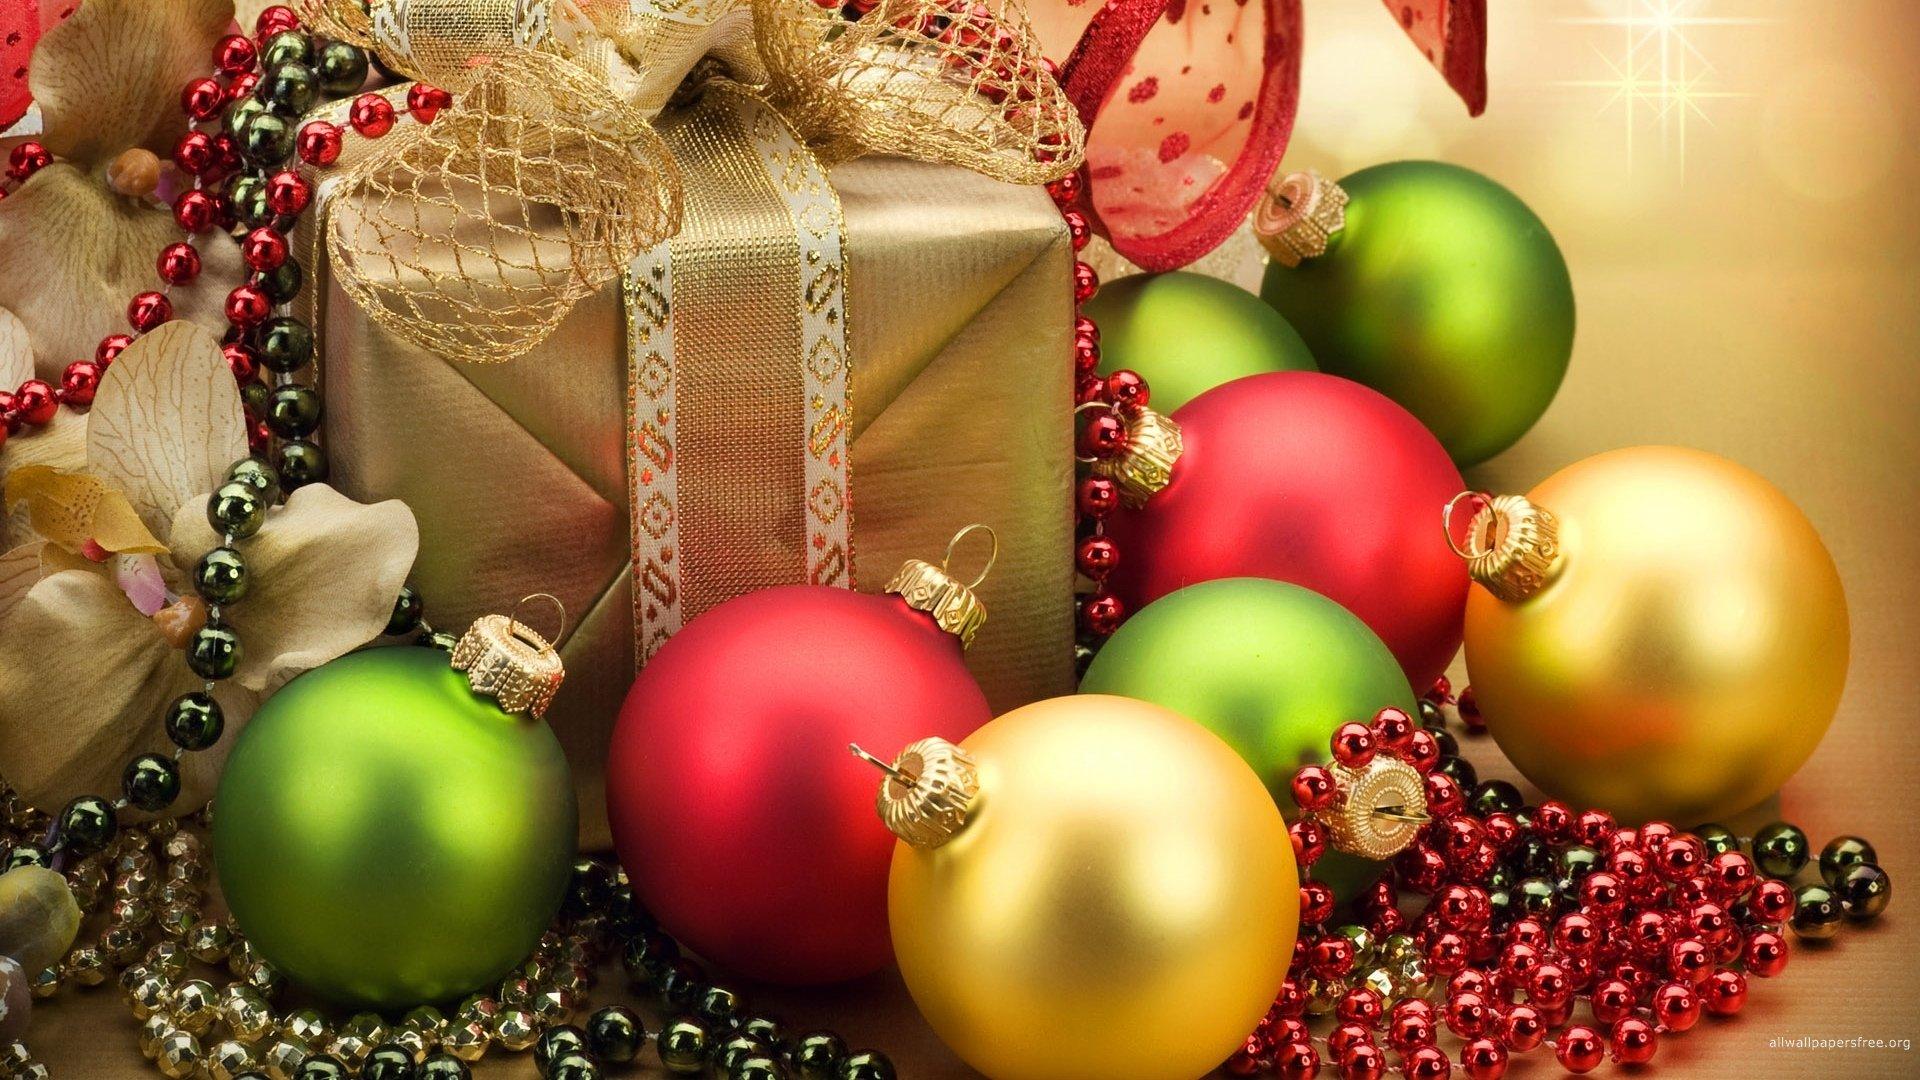 Wallpaper 1920x1080 Px Beautiful Christmas Gift Holiday Merry Santa Snow Tree Winter 1920x1080 4kwallpaper 1795677 Hd Wallpapers Wallhere